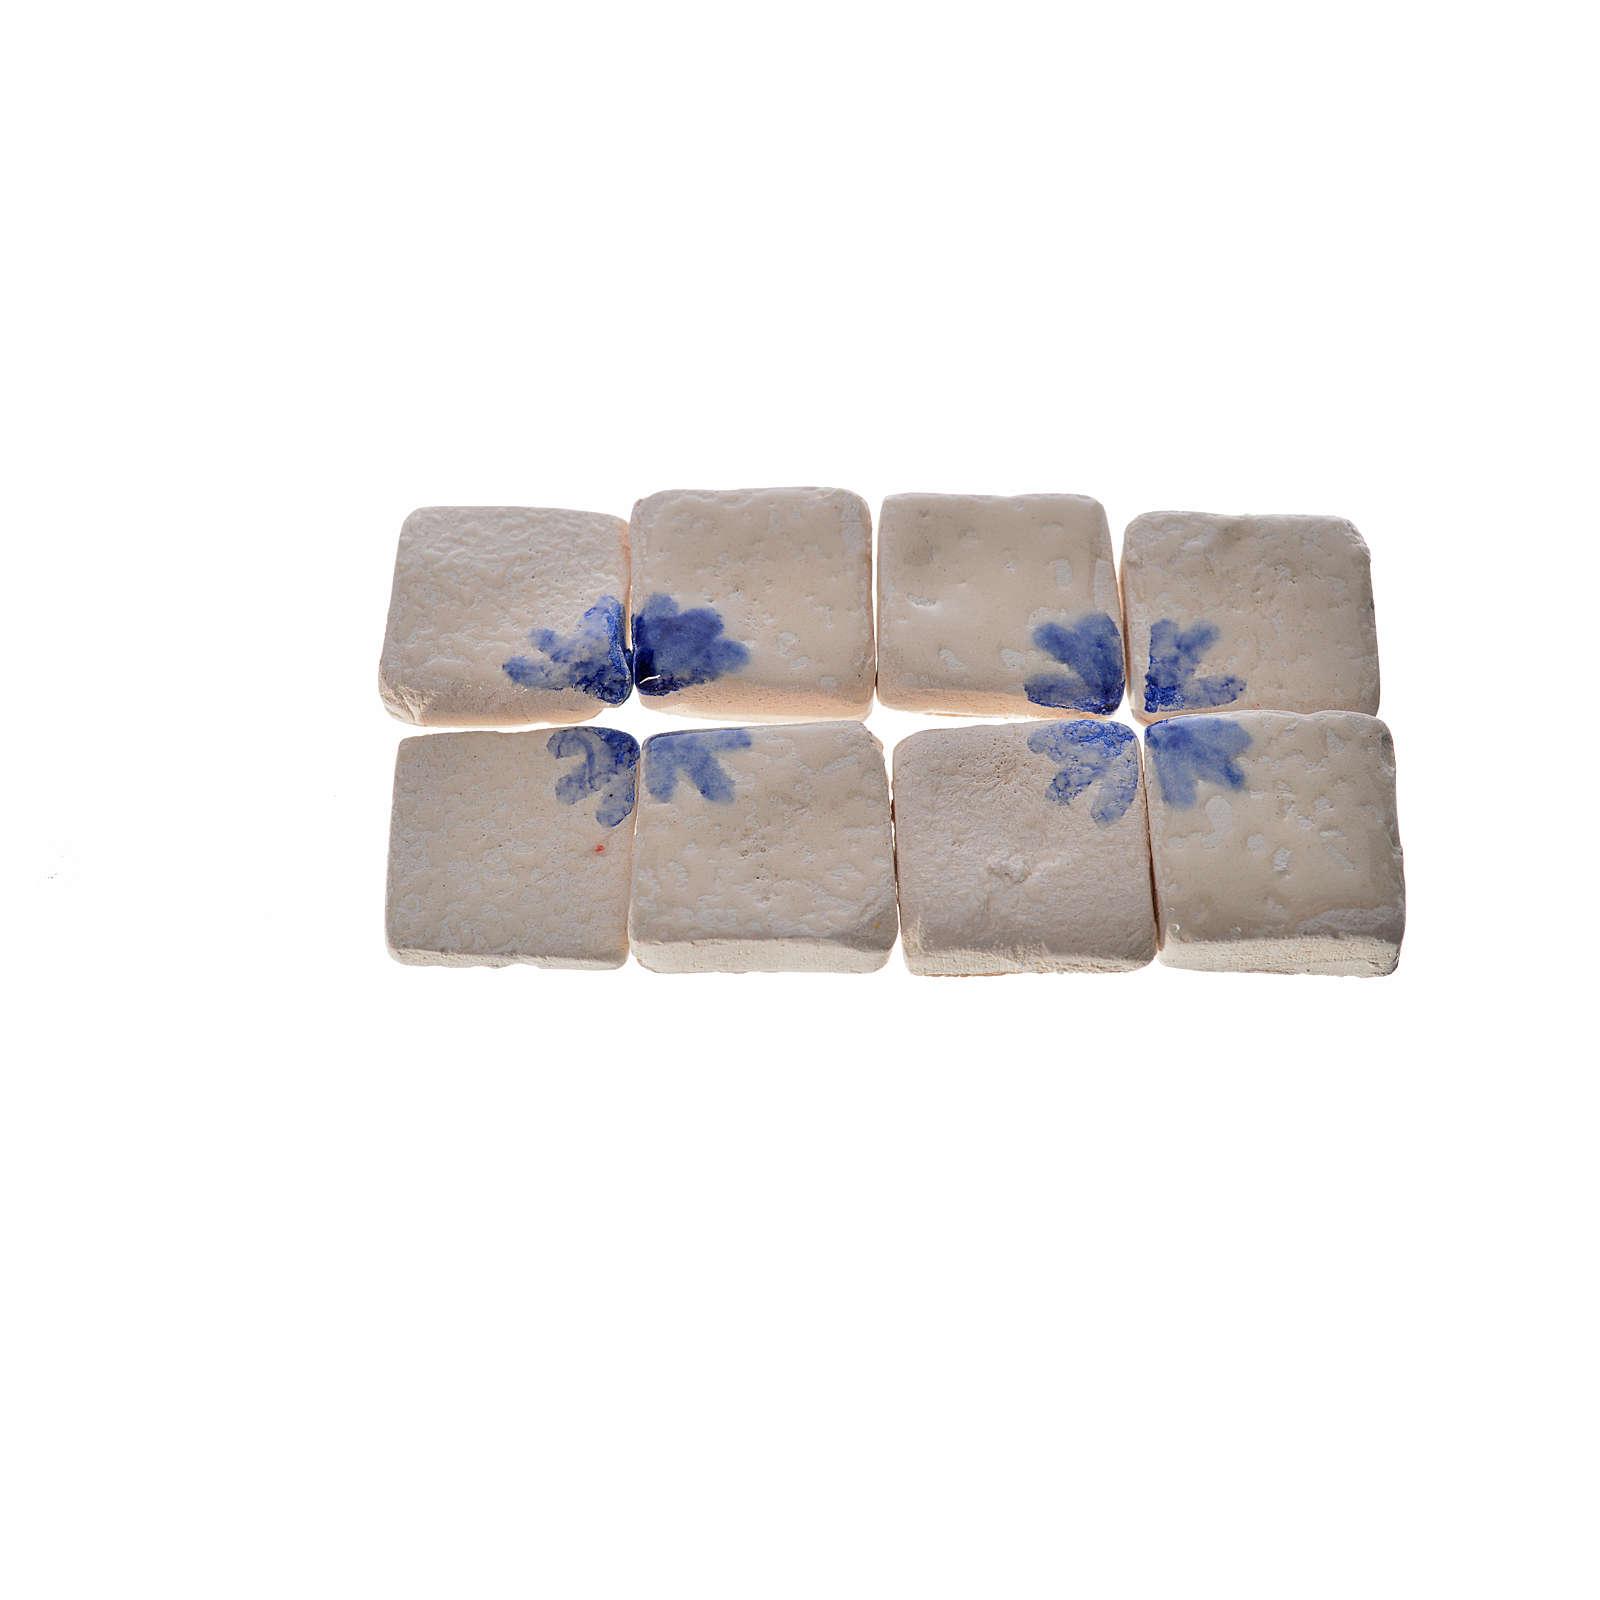 Mattonelle terracotta smaltate 60 pz freccia blu per presepe 4